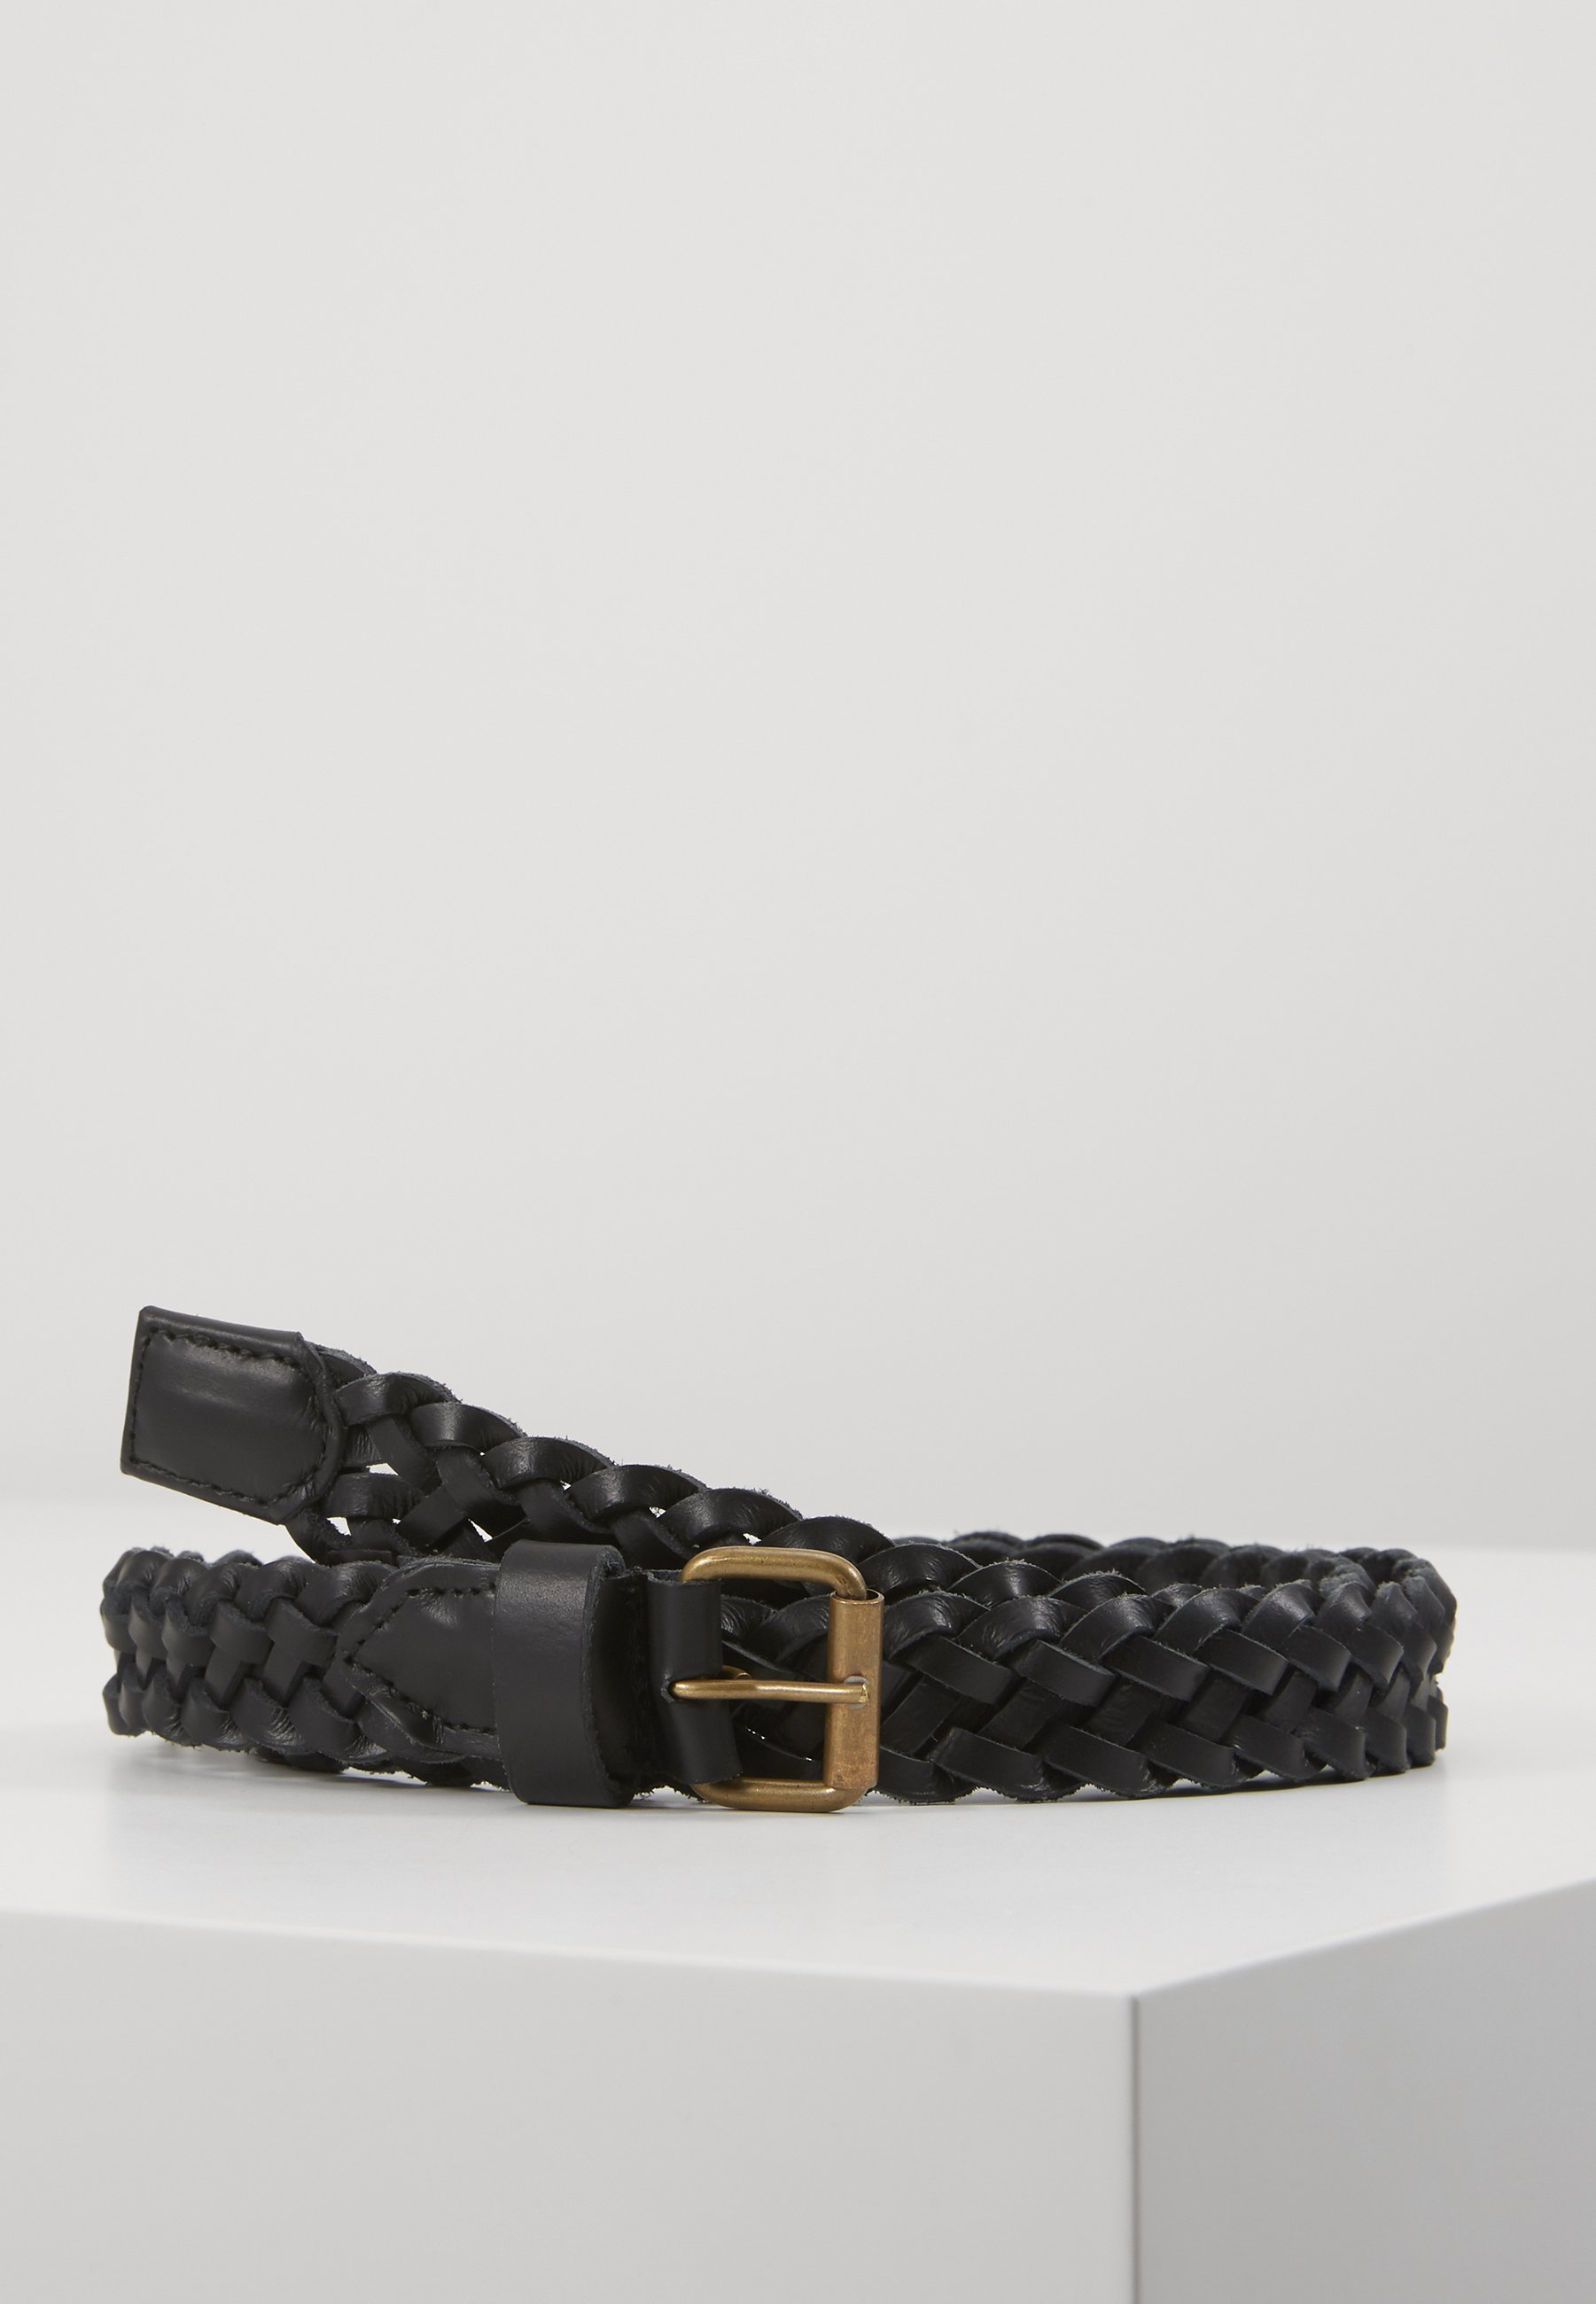 Men JACNATE BRAIDED BELT - Braided belt